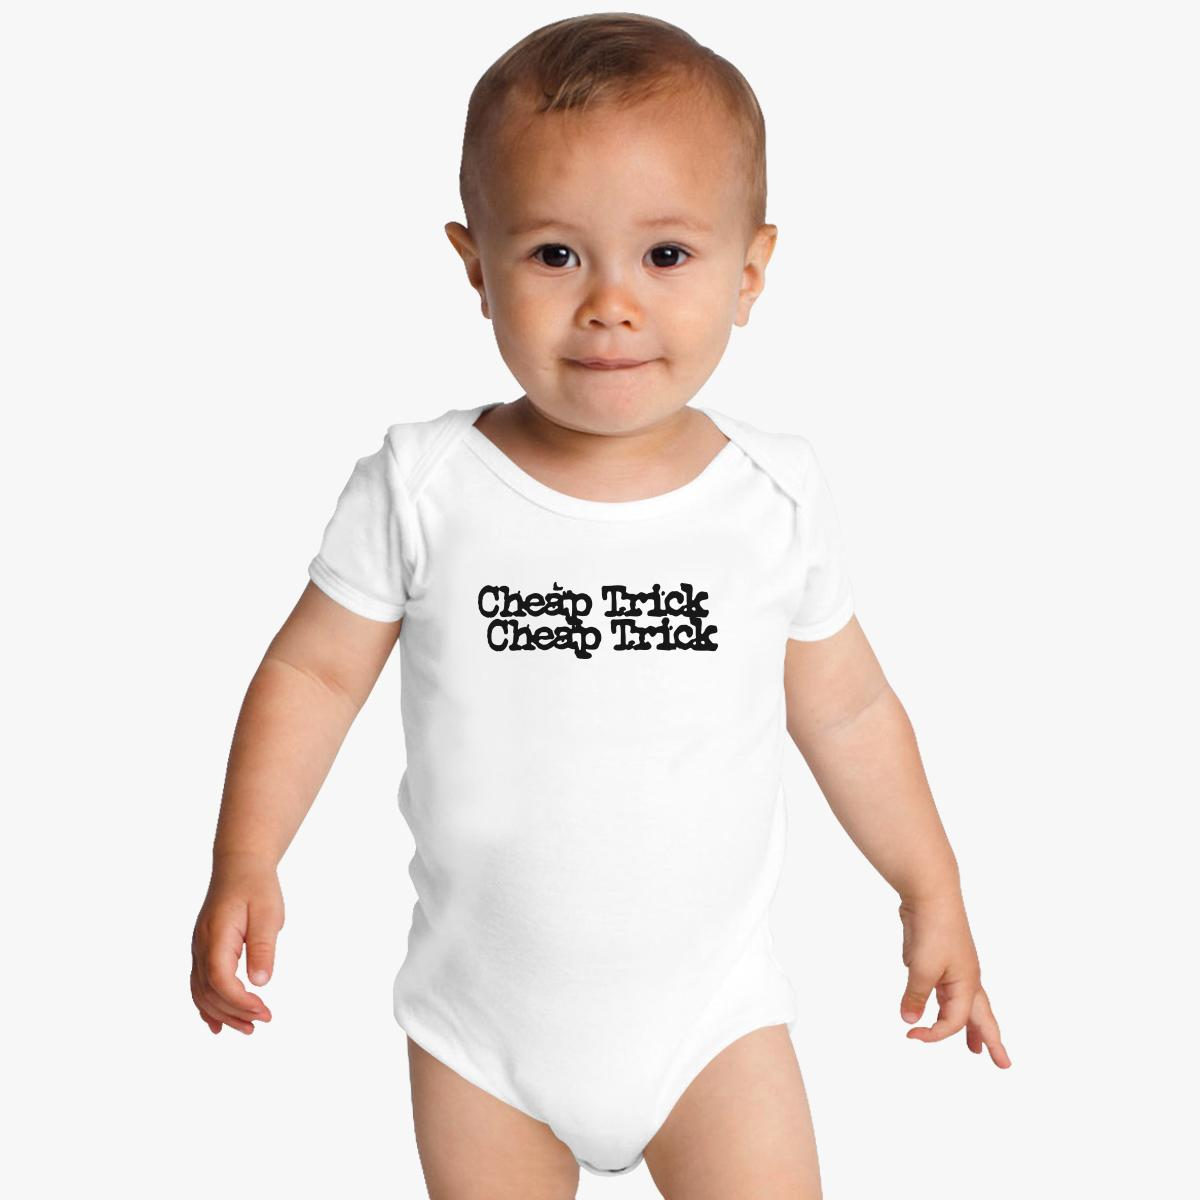 Cheap Trick band logo Baby Onesies | Customon.com